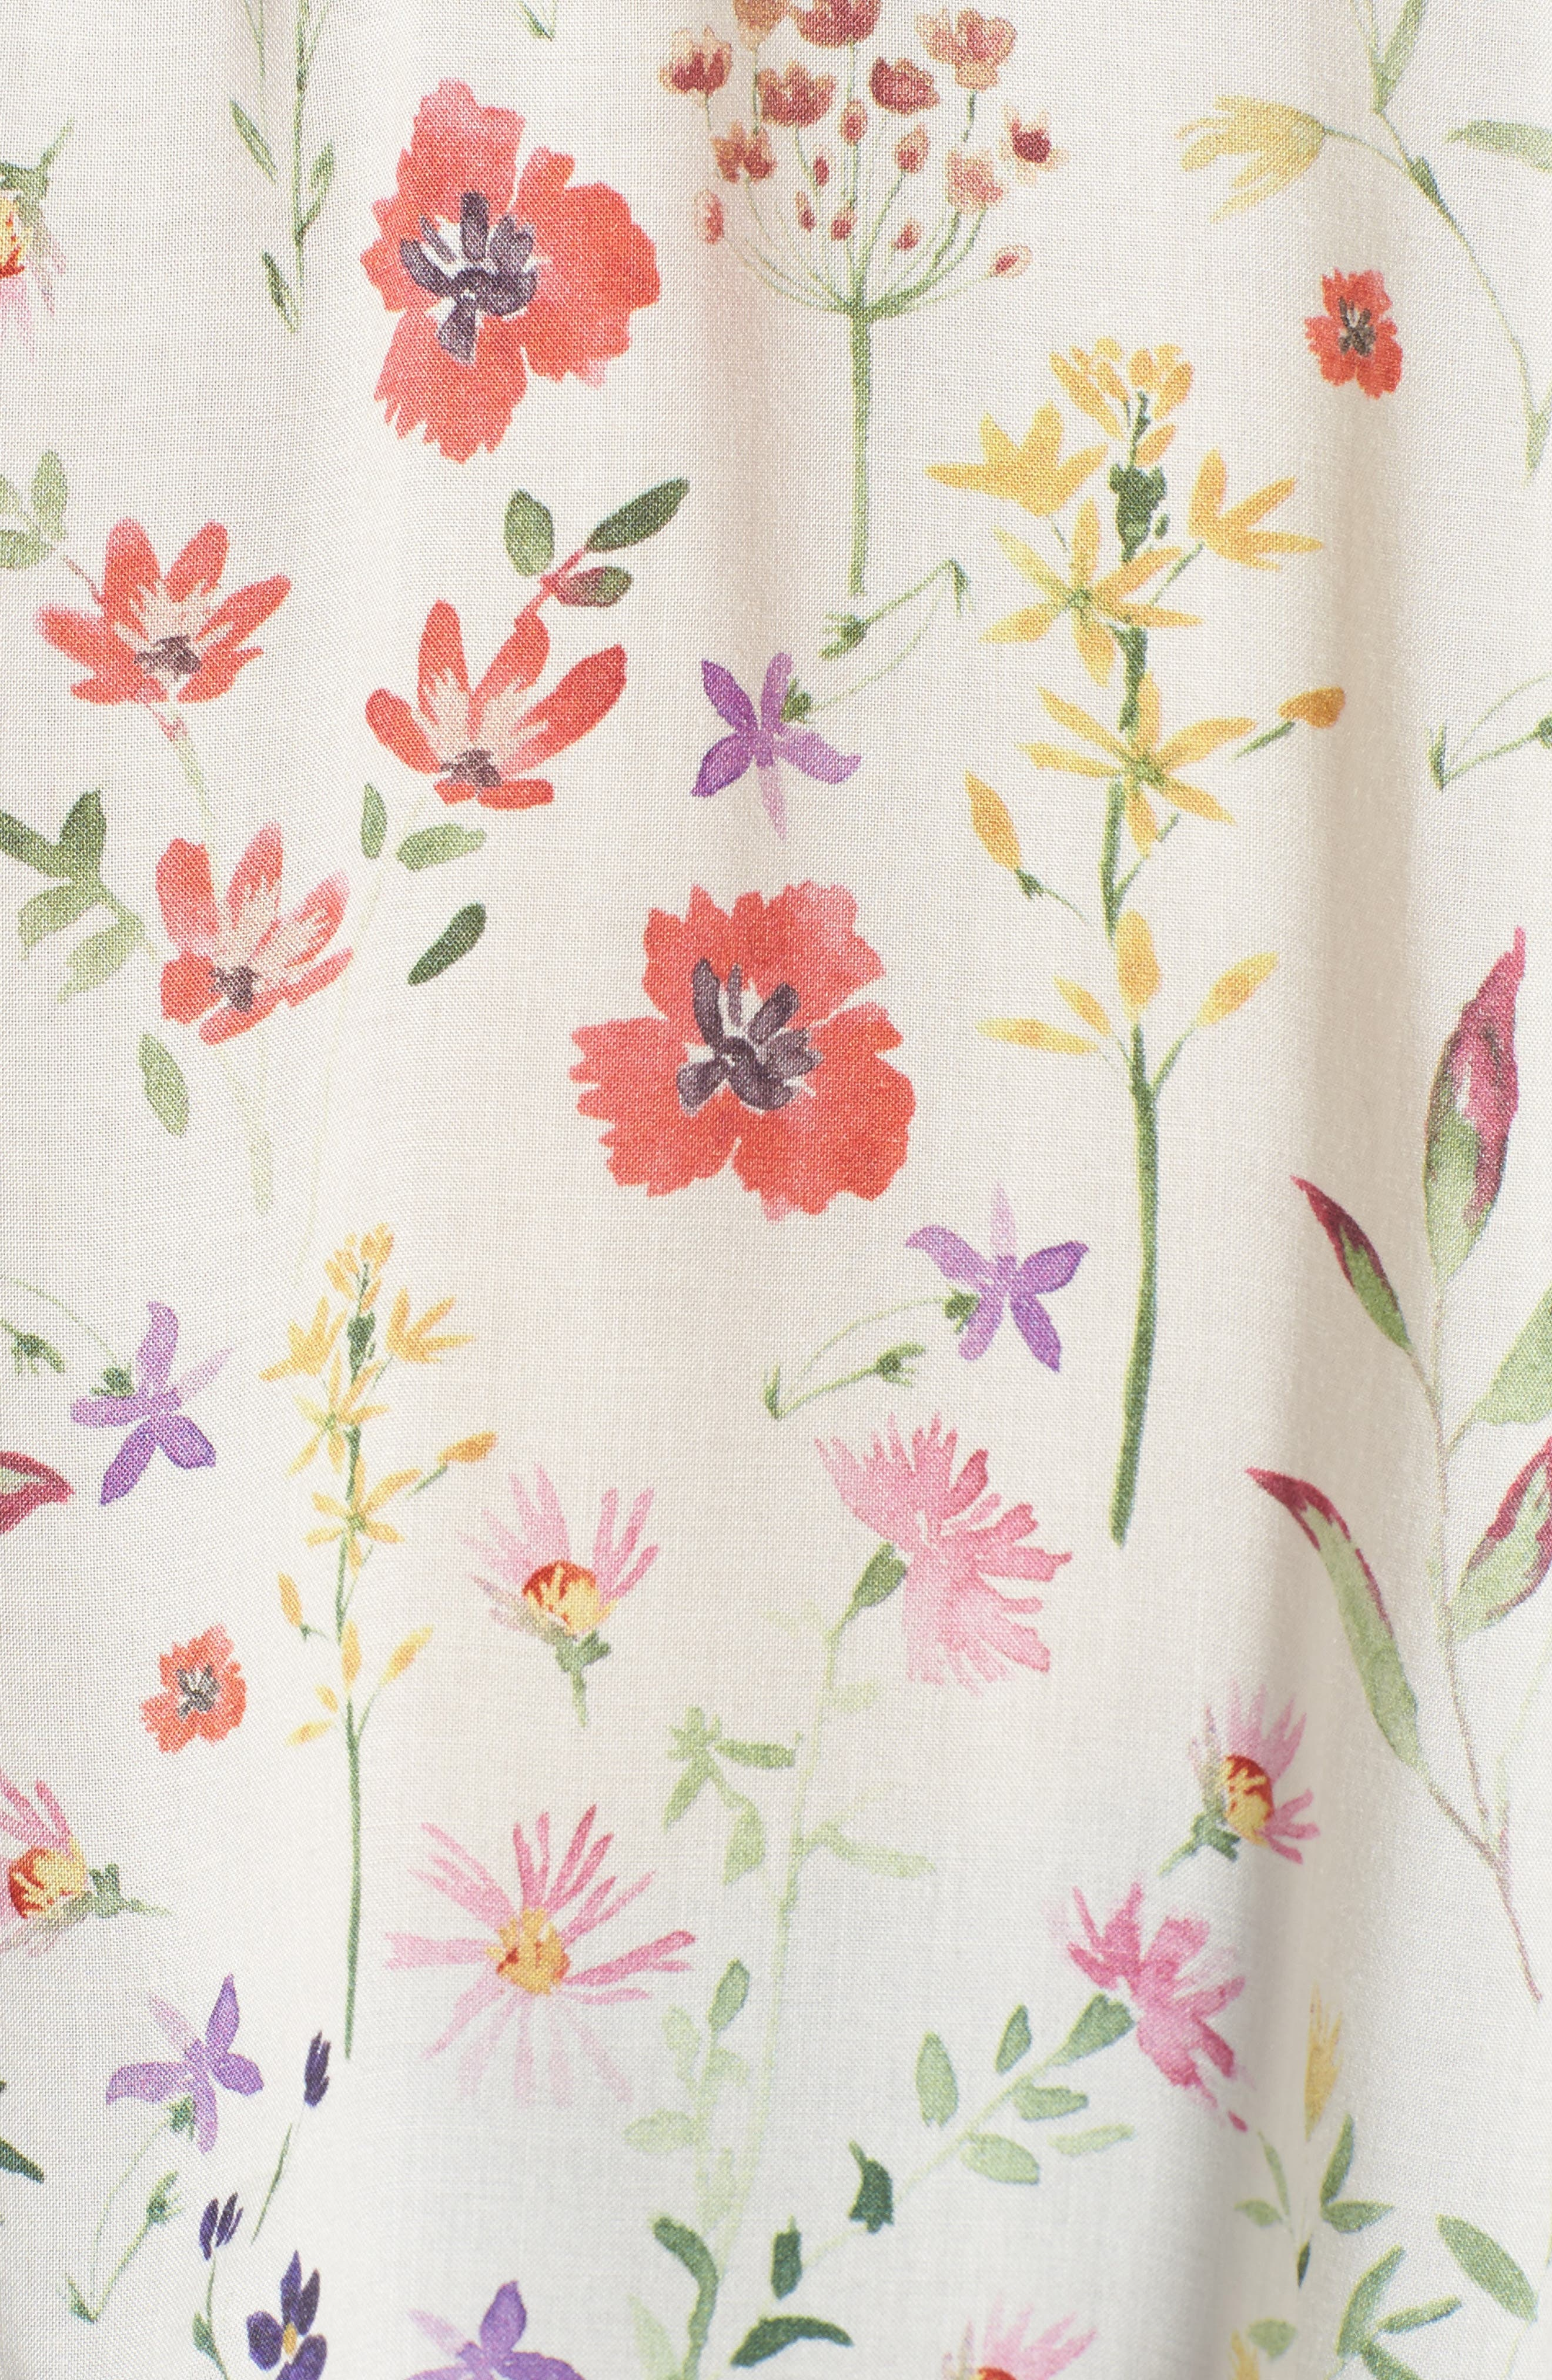 Spring Floral Peasant Top,                             Alternate thumbnail 6, color,                             White Multi